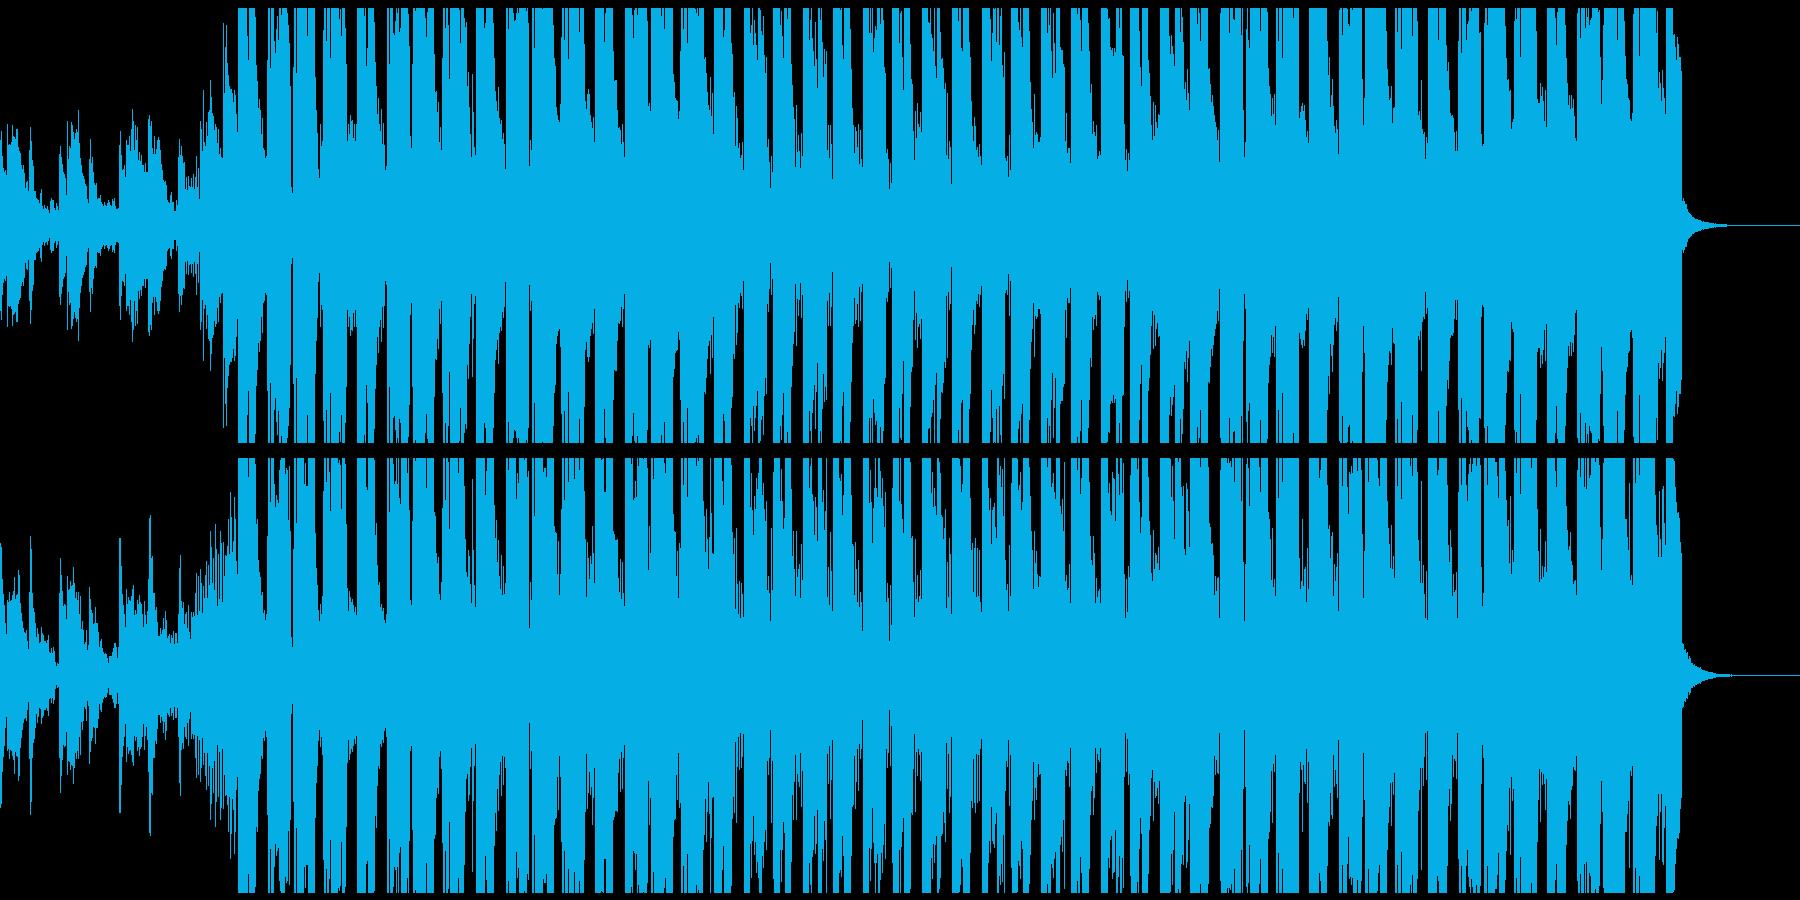 CM・企業VP等に モチベーションEDMの再生済みの波形